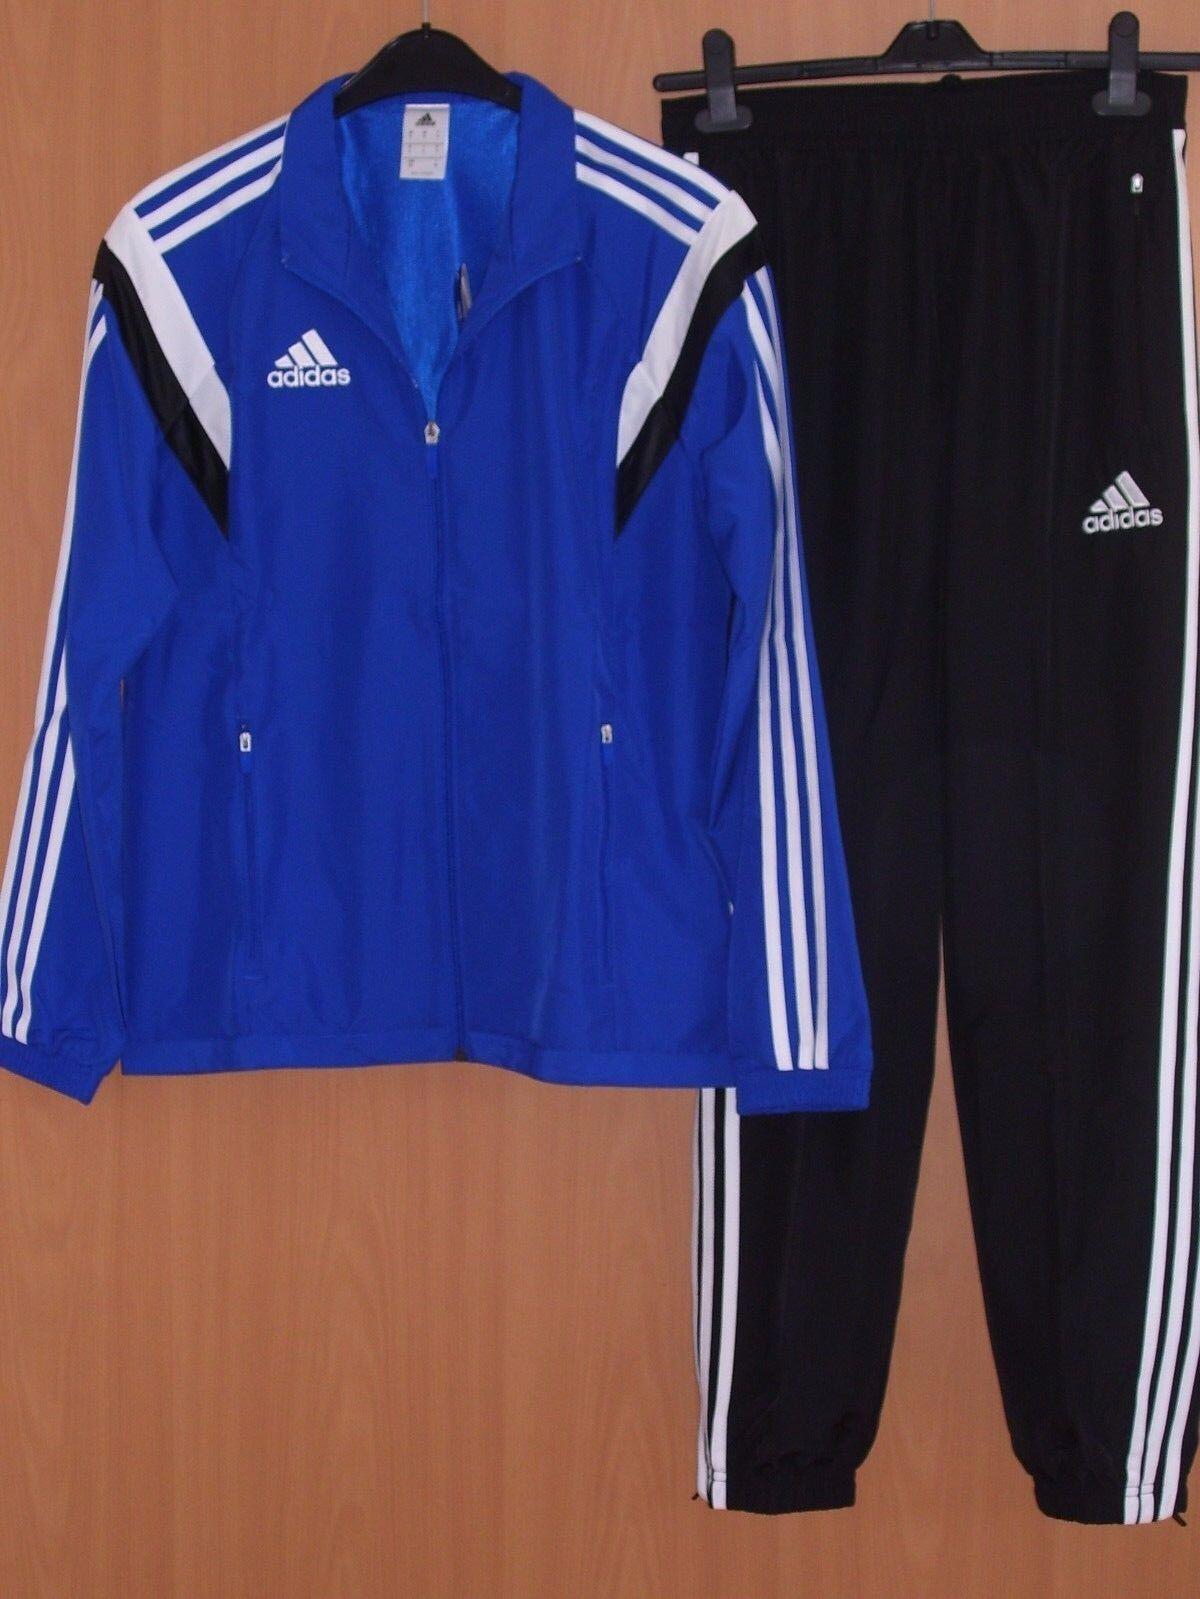 Adidas Herren Condivo 14 Präsentationsanzug Blau Weiß,Adidas